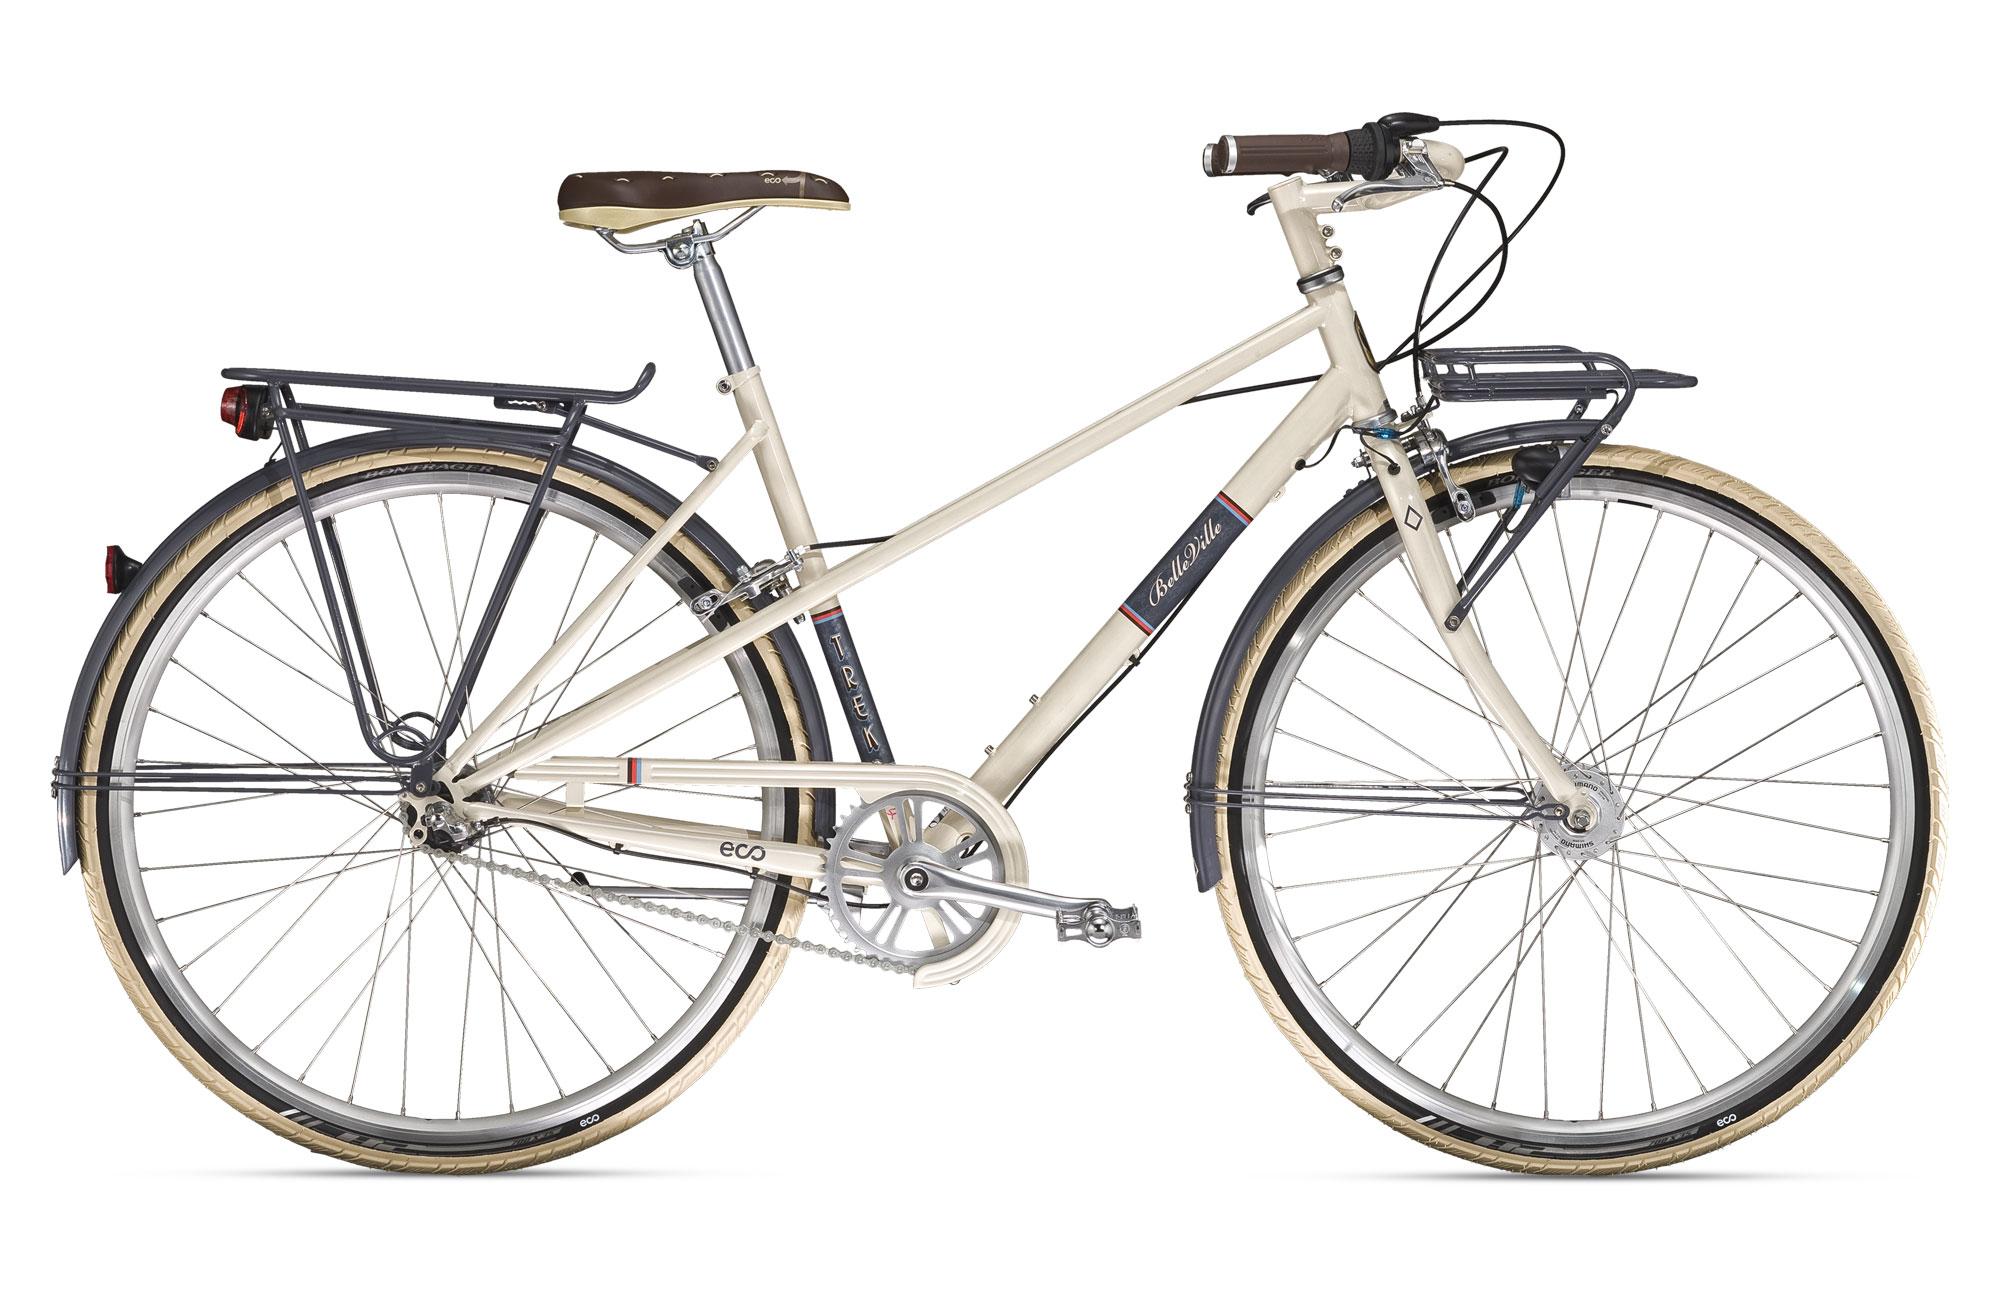 Retro Mixte Bike Belleville Themovement Com